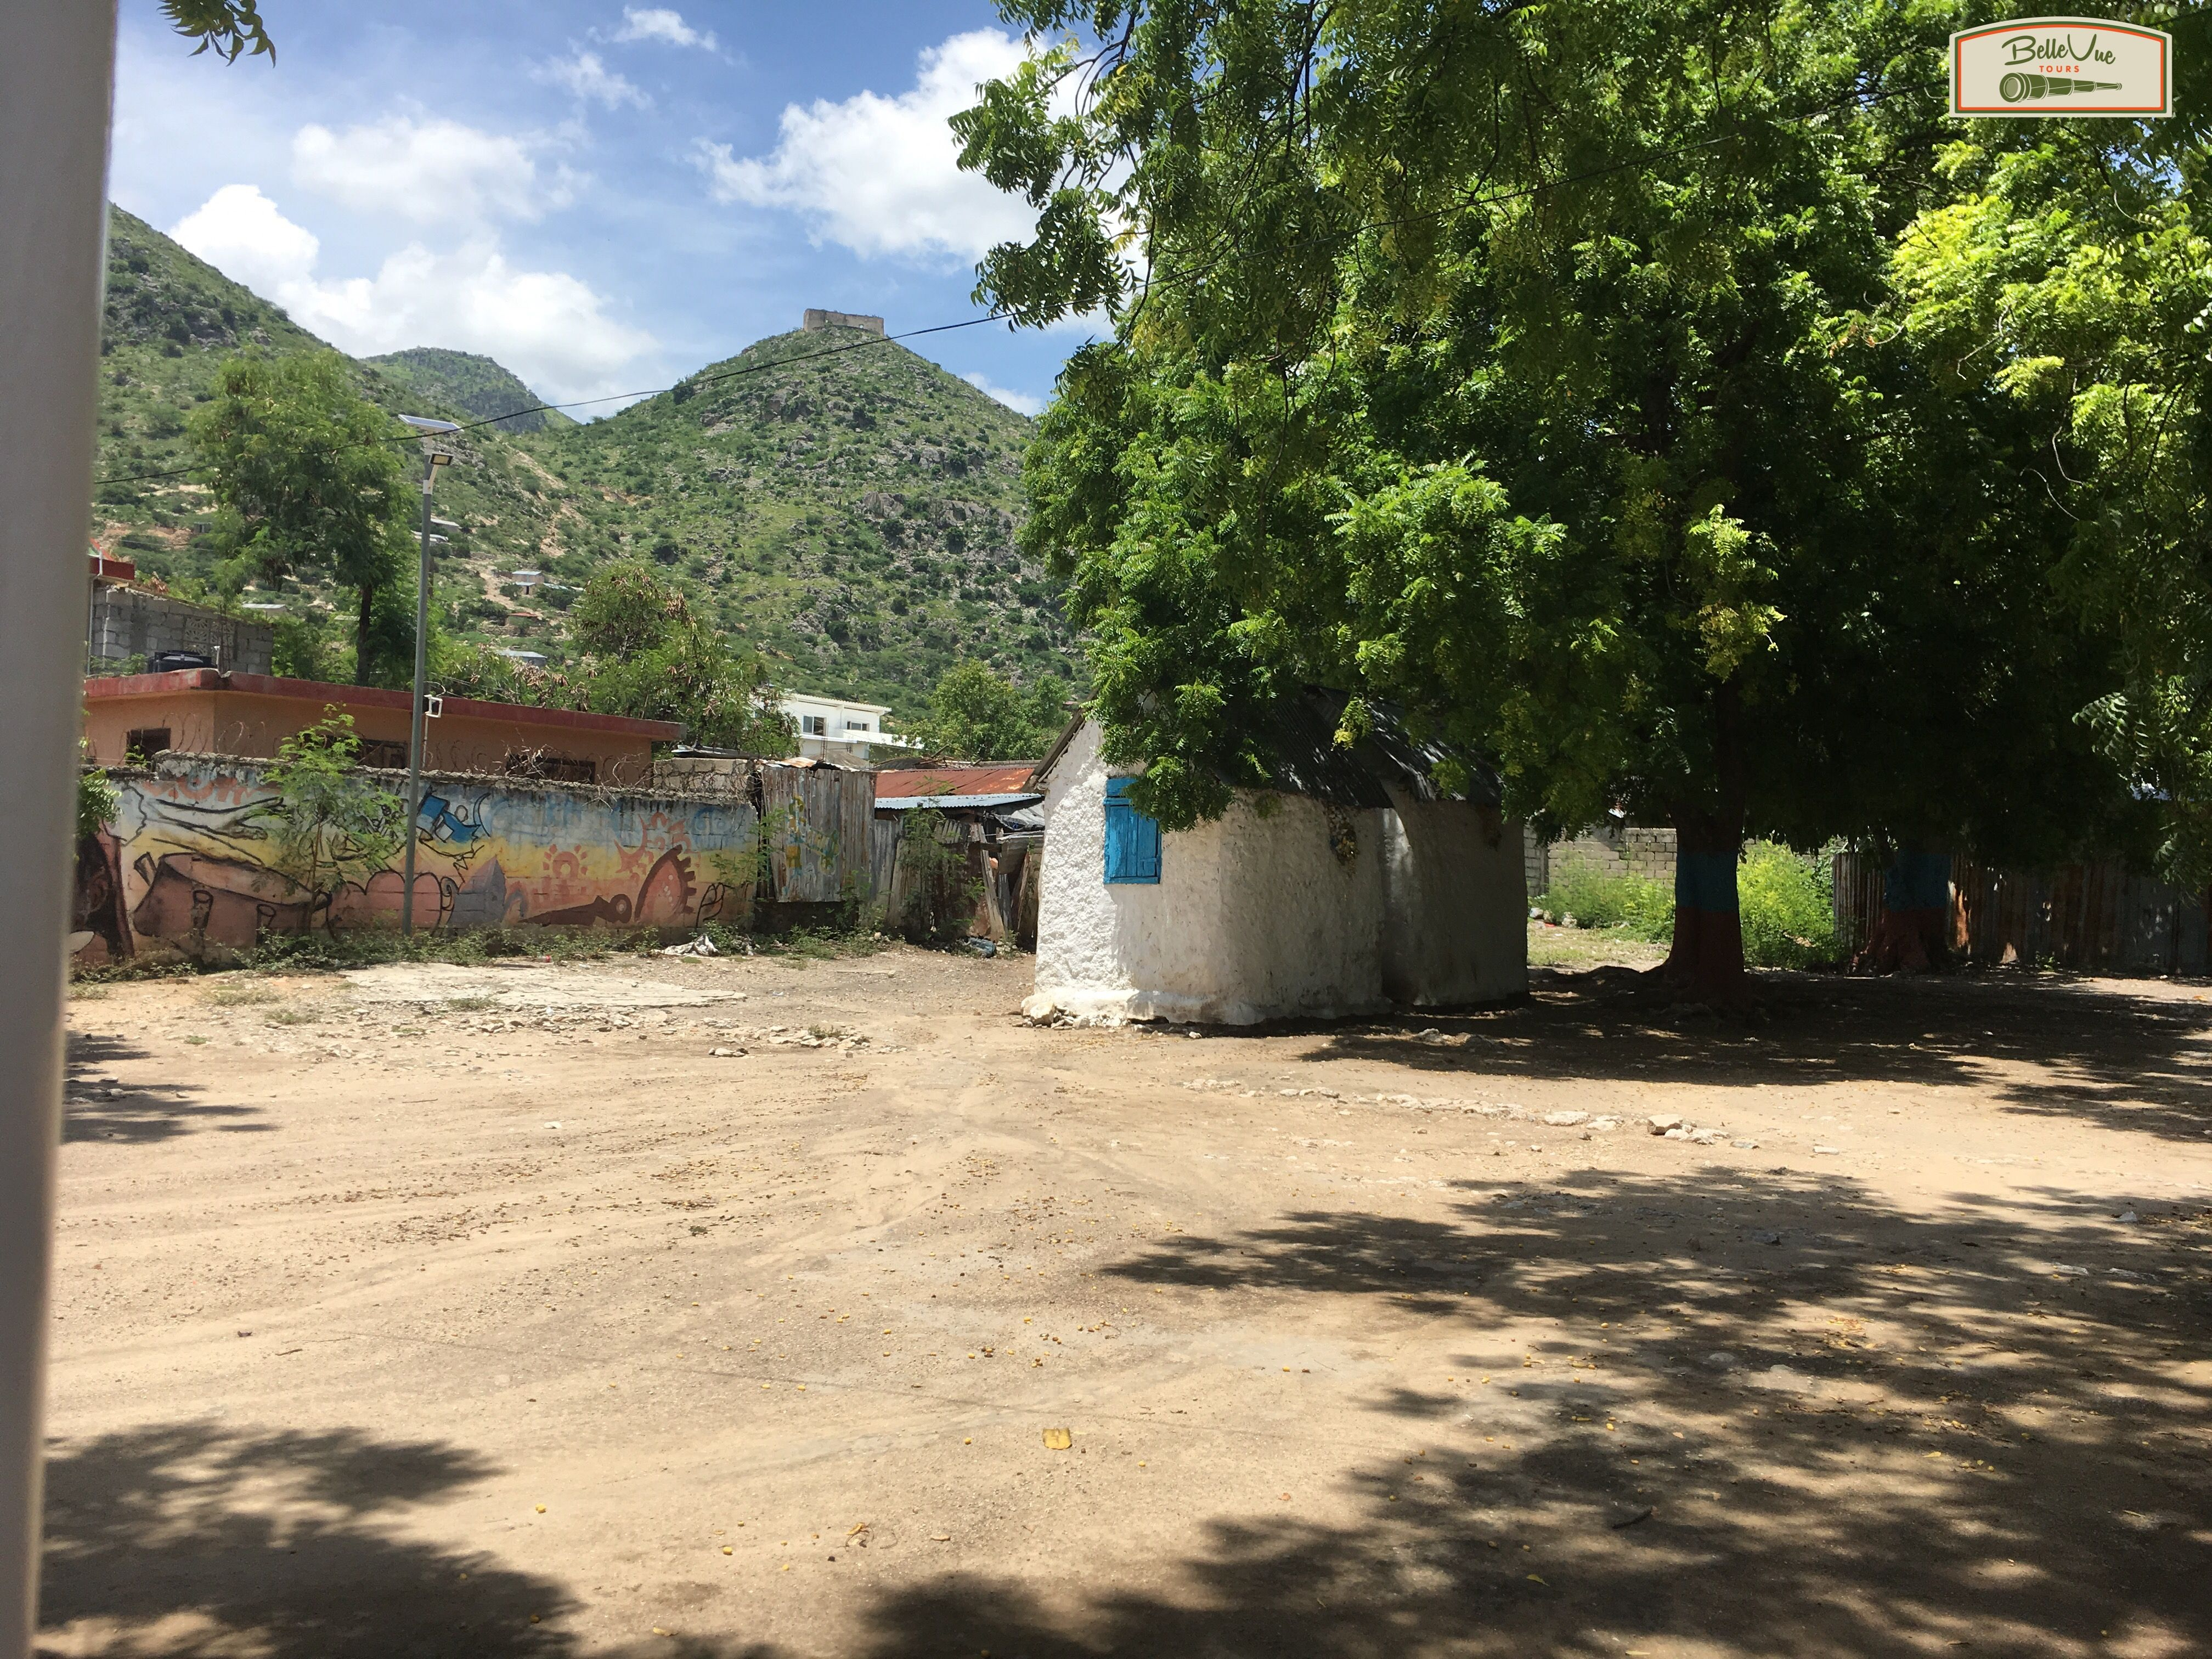 Pin On North Haiti Tour